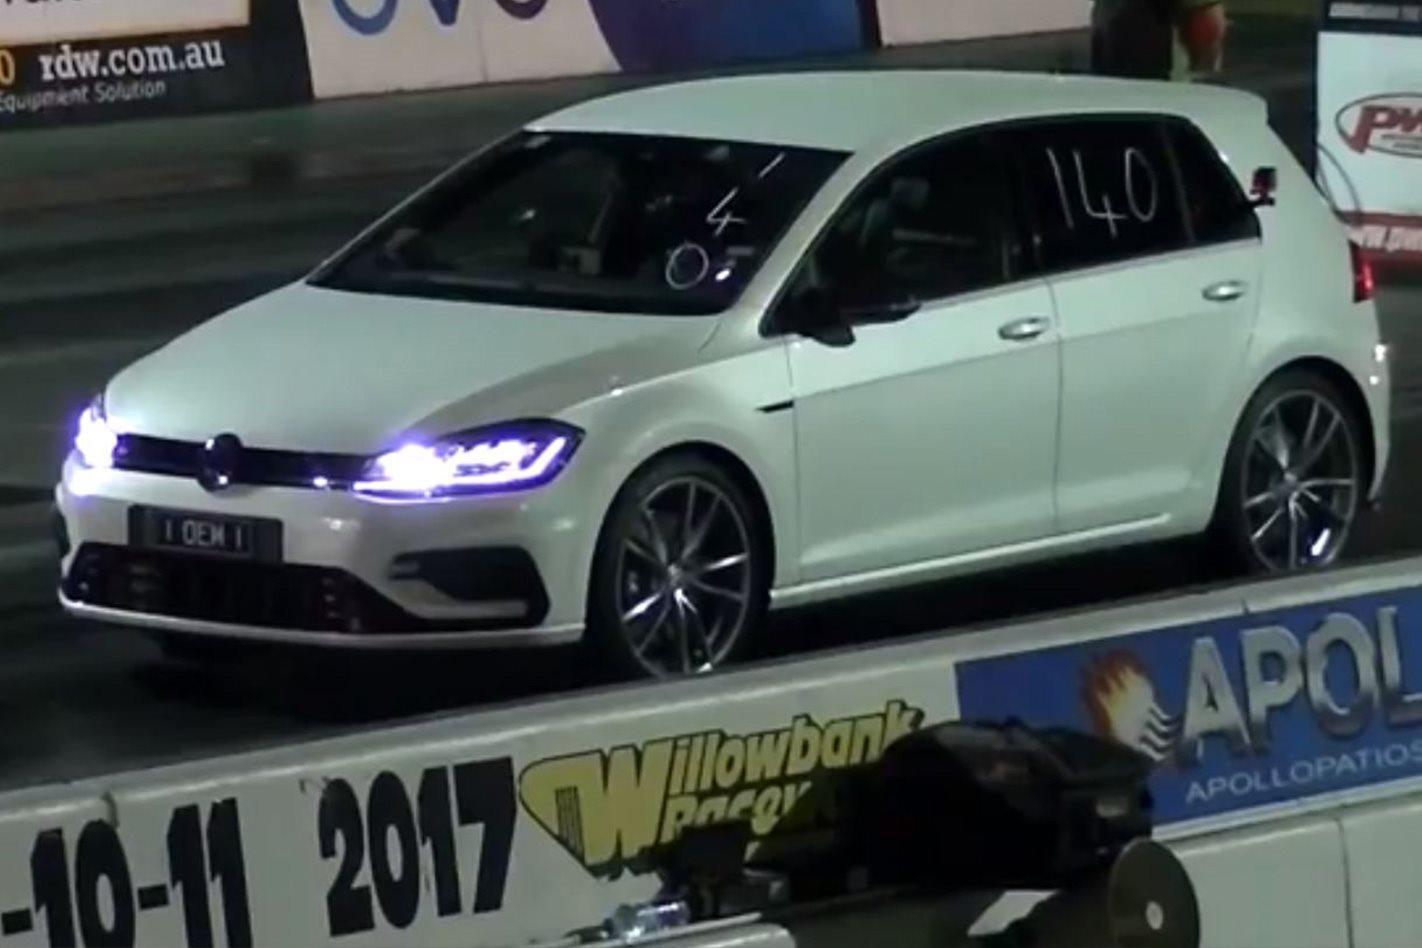 Volkswagen Golf R 7.5 targets sub-3sec 0-100km/h